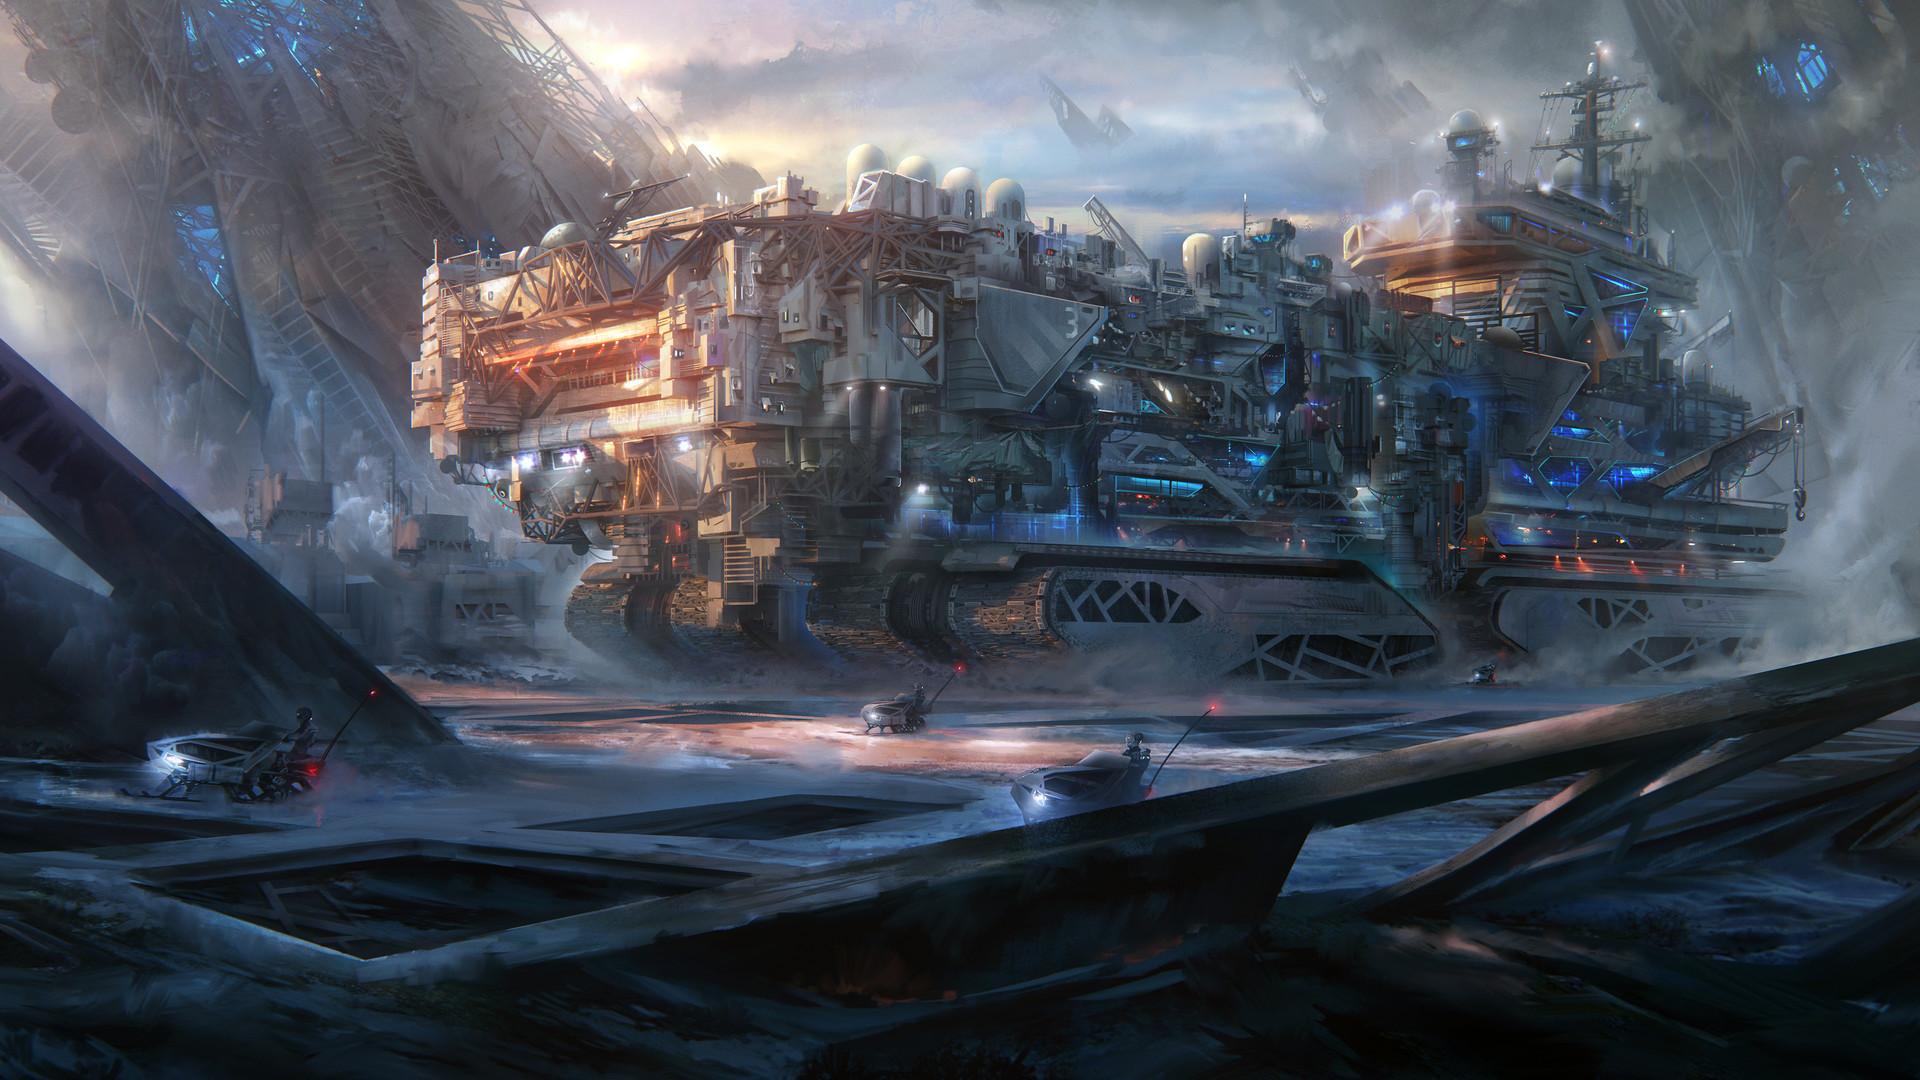 The sci fi art of leon tukker science fiction artist for Sci fi decor